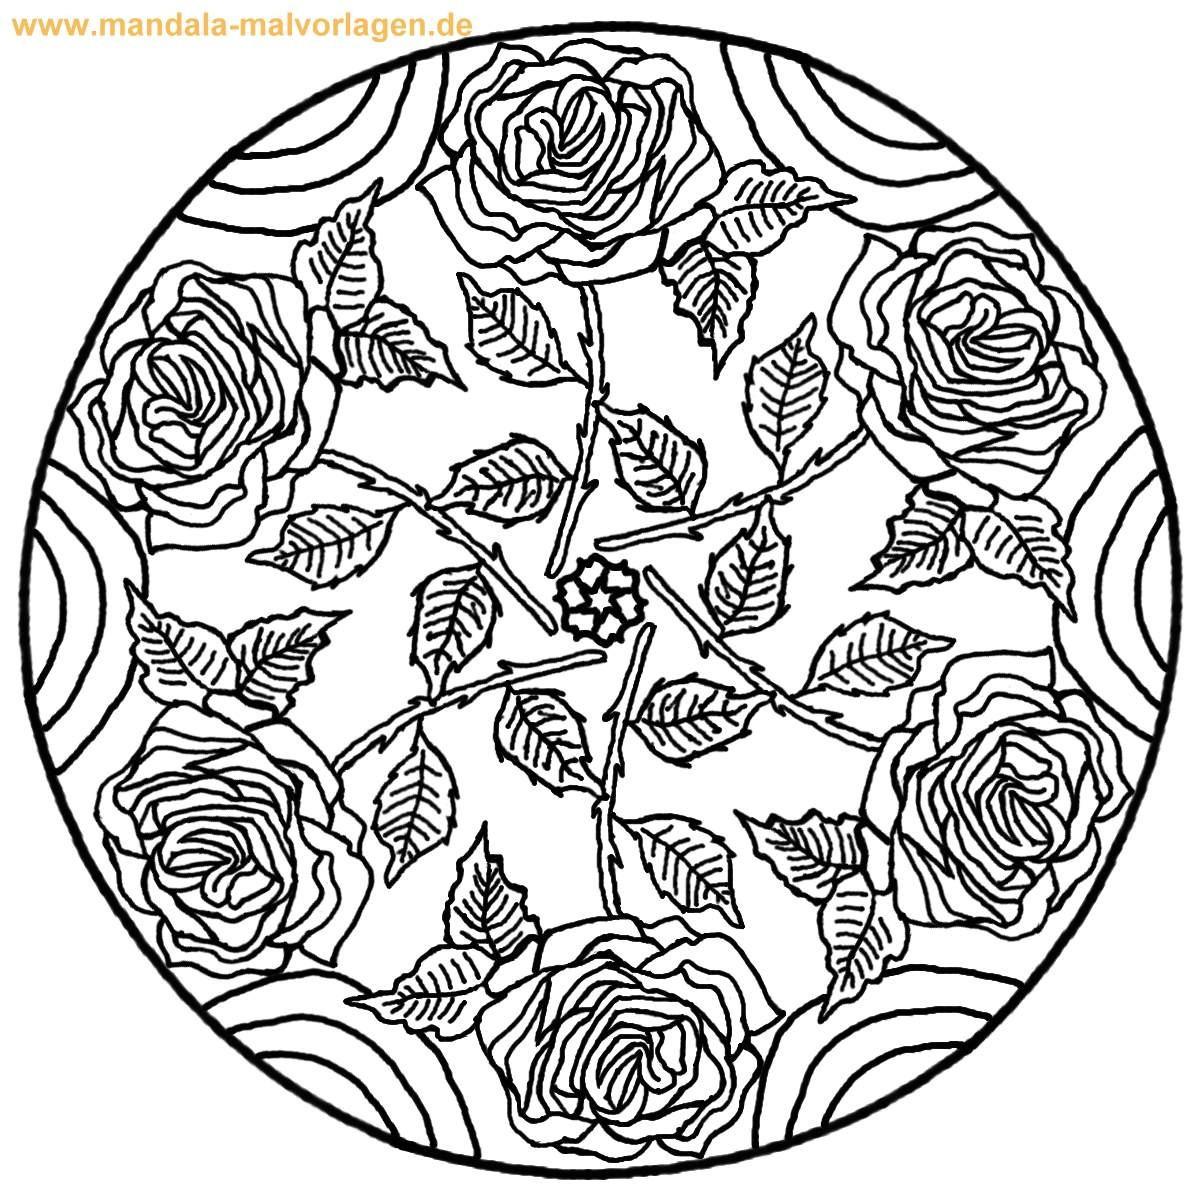 Ausmalbilder Frühling Mandala  Ausmalbilder Blumen Mandalas Rosen Mandala